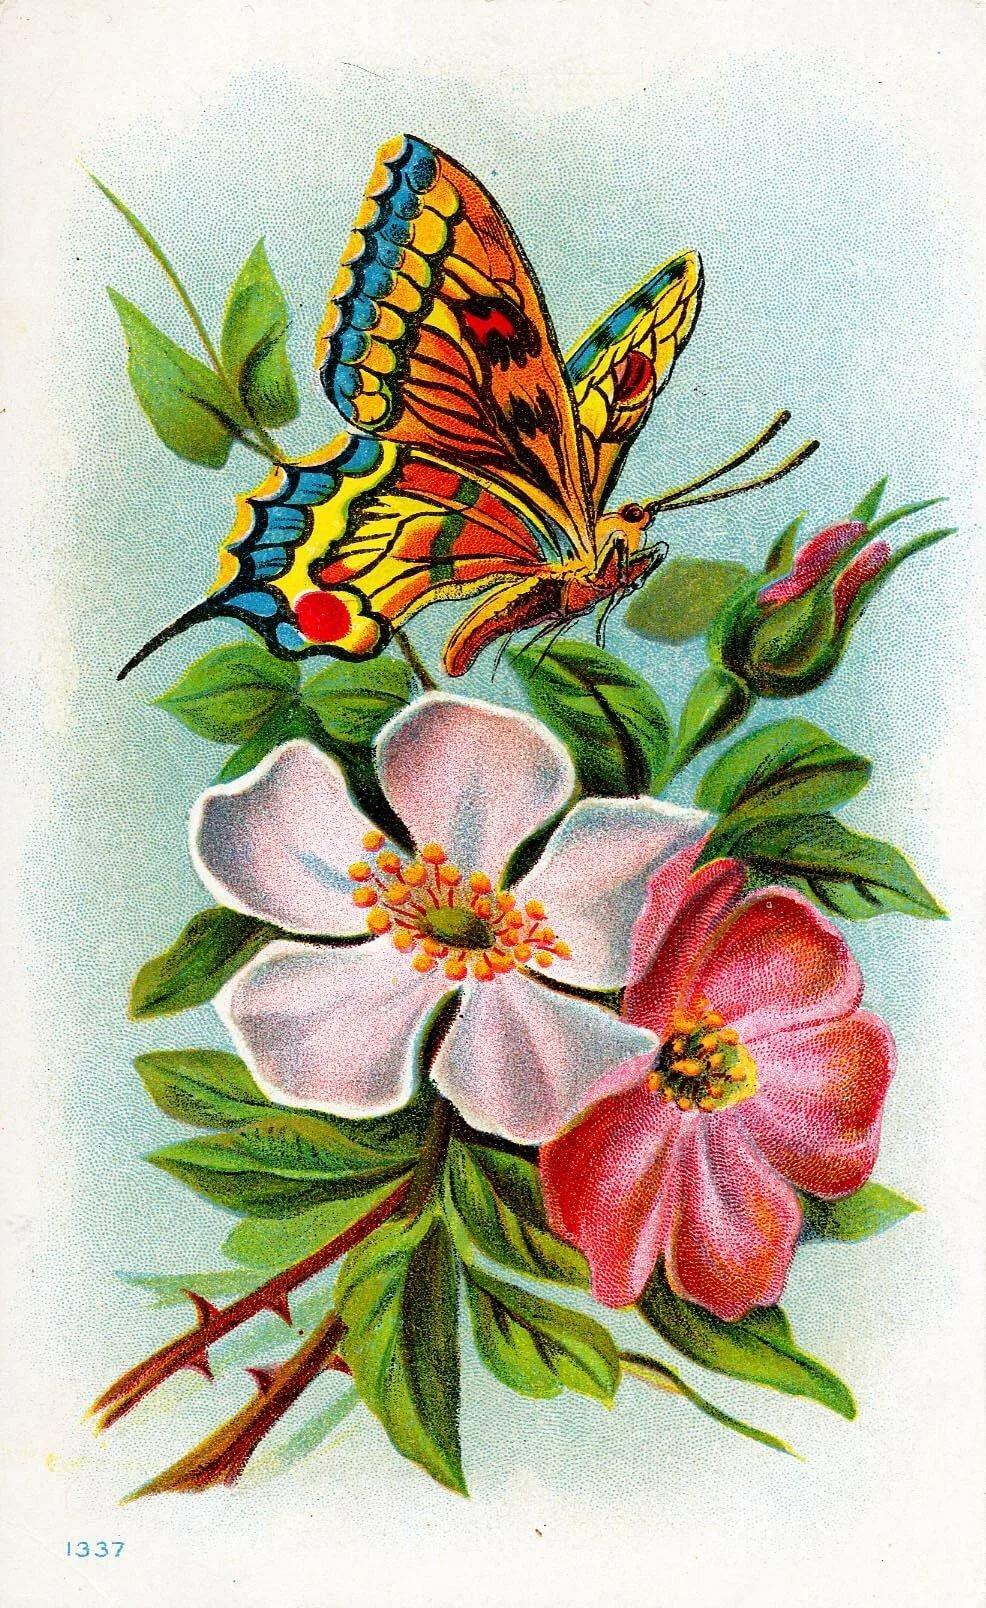 Открытка бабочка и цветок, качелях